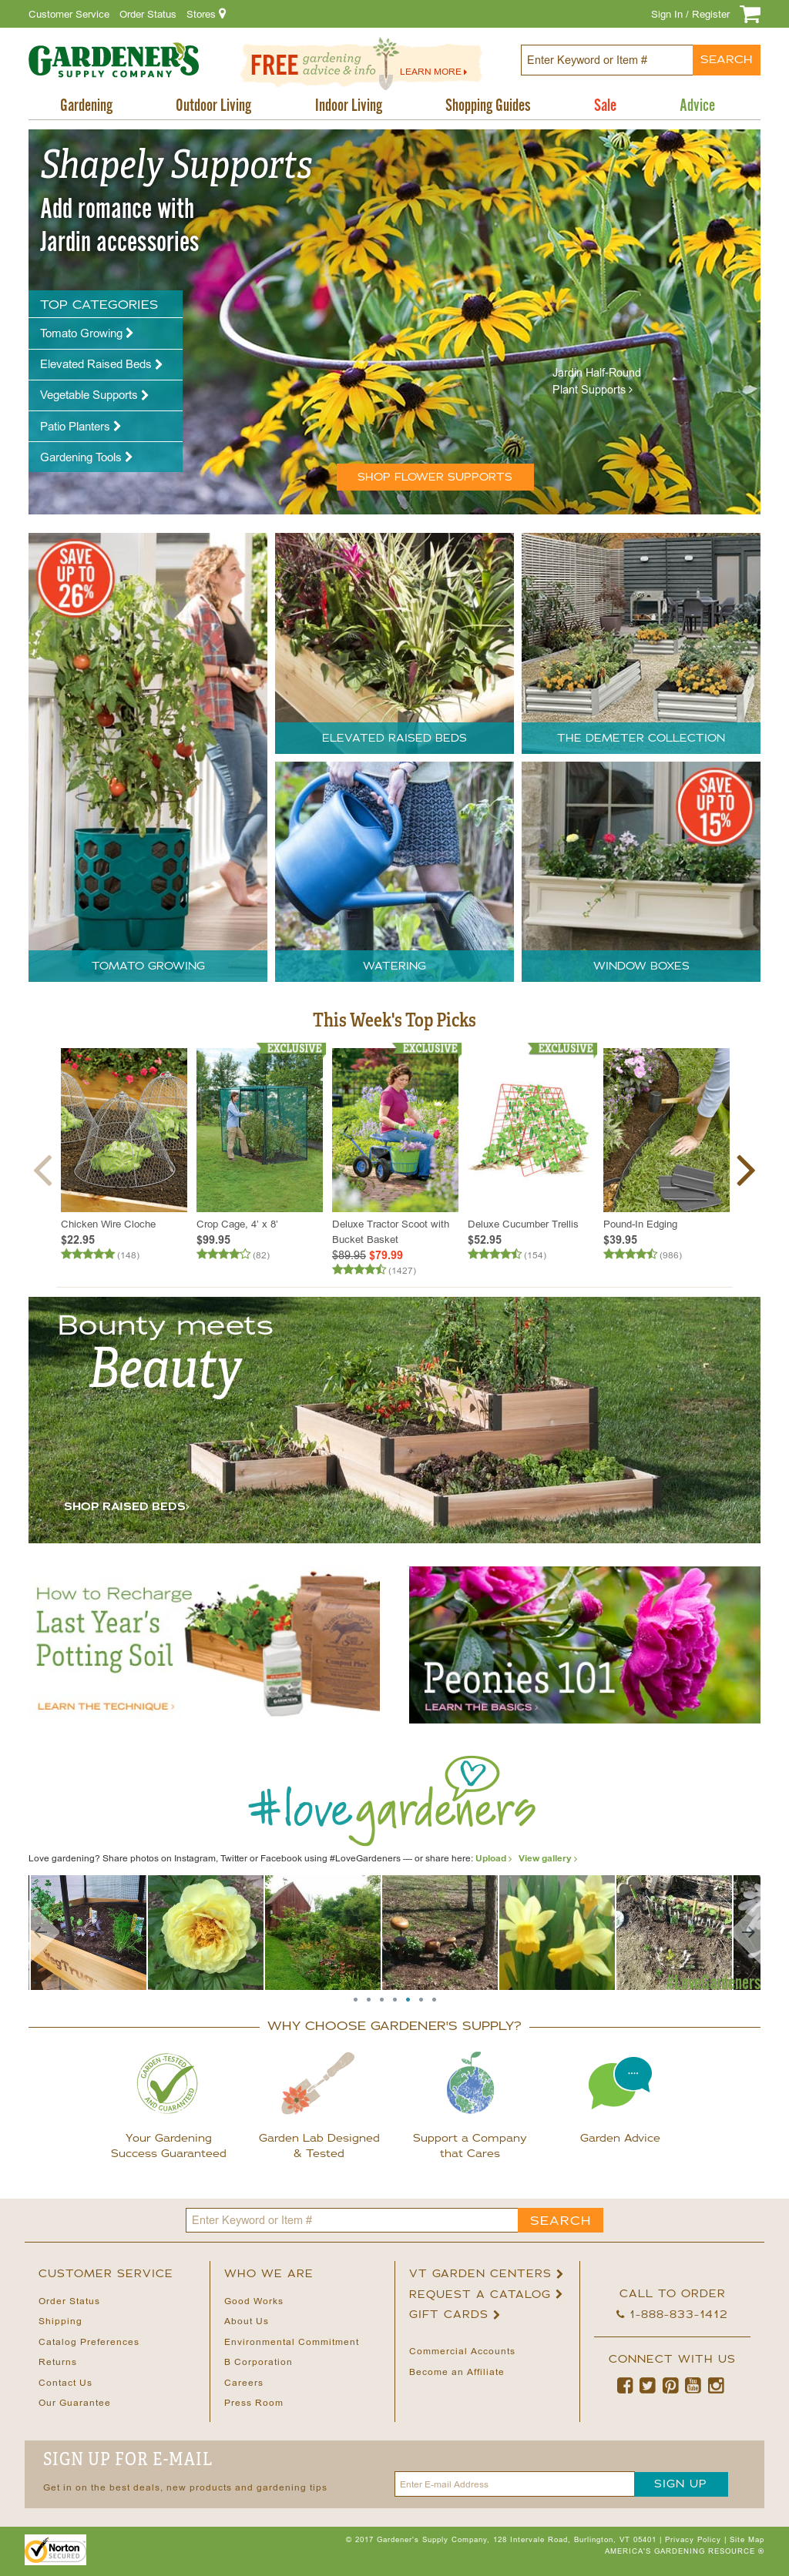 Gardeneru0027s Supply Competitors, Revenue And Employees   Owler Company Profile